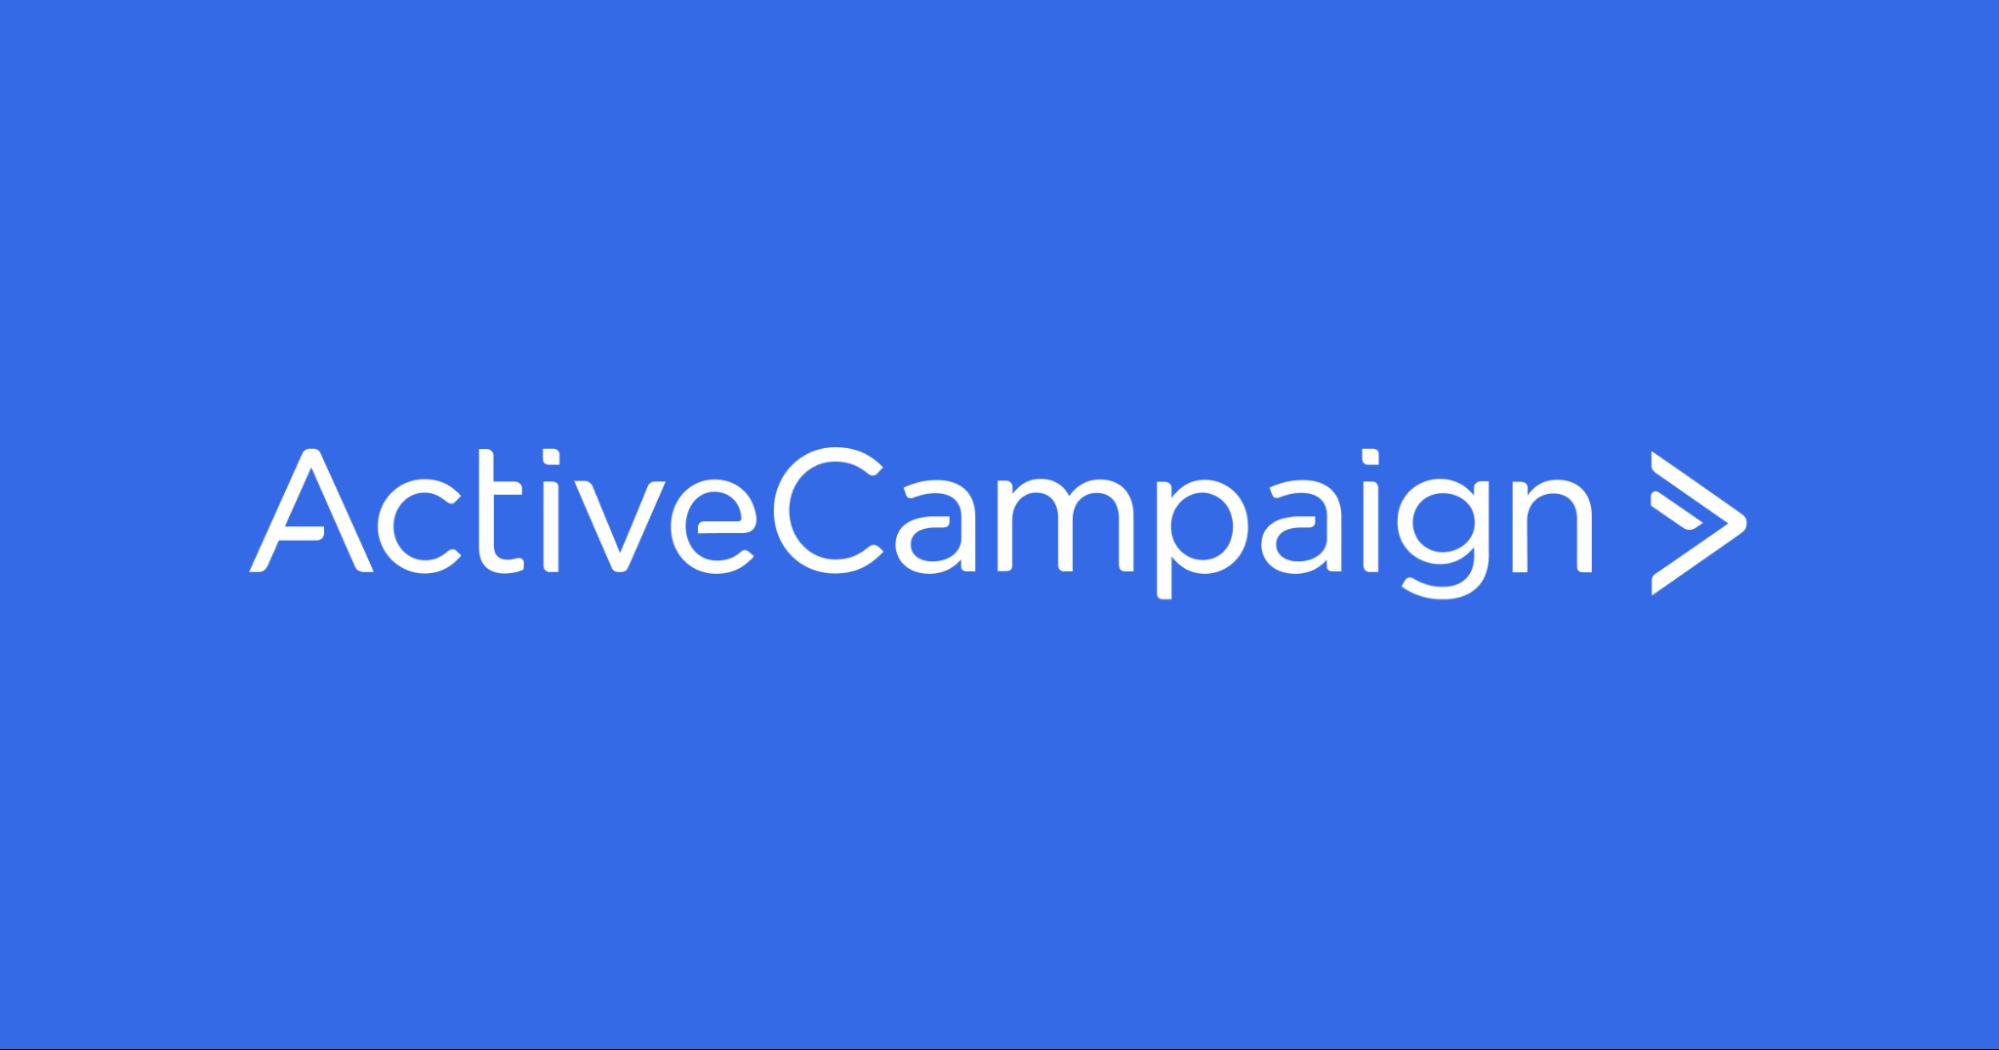 ActiveCampaign's logo